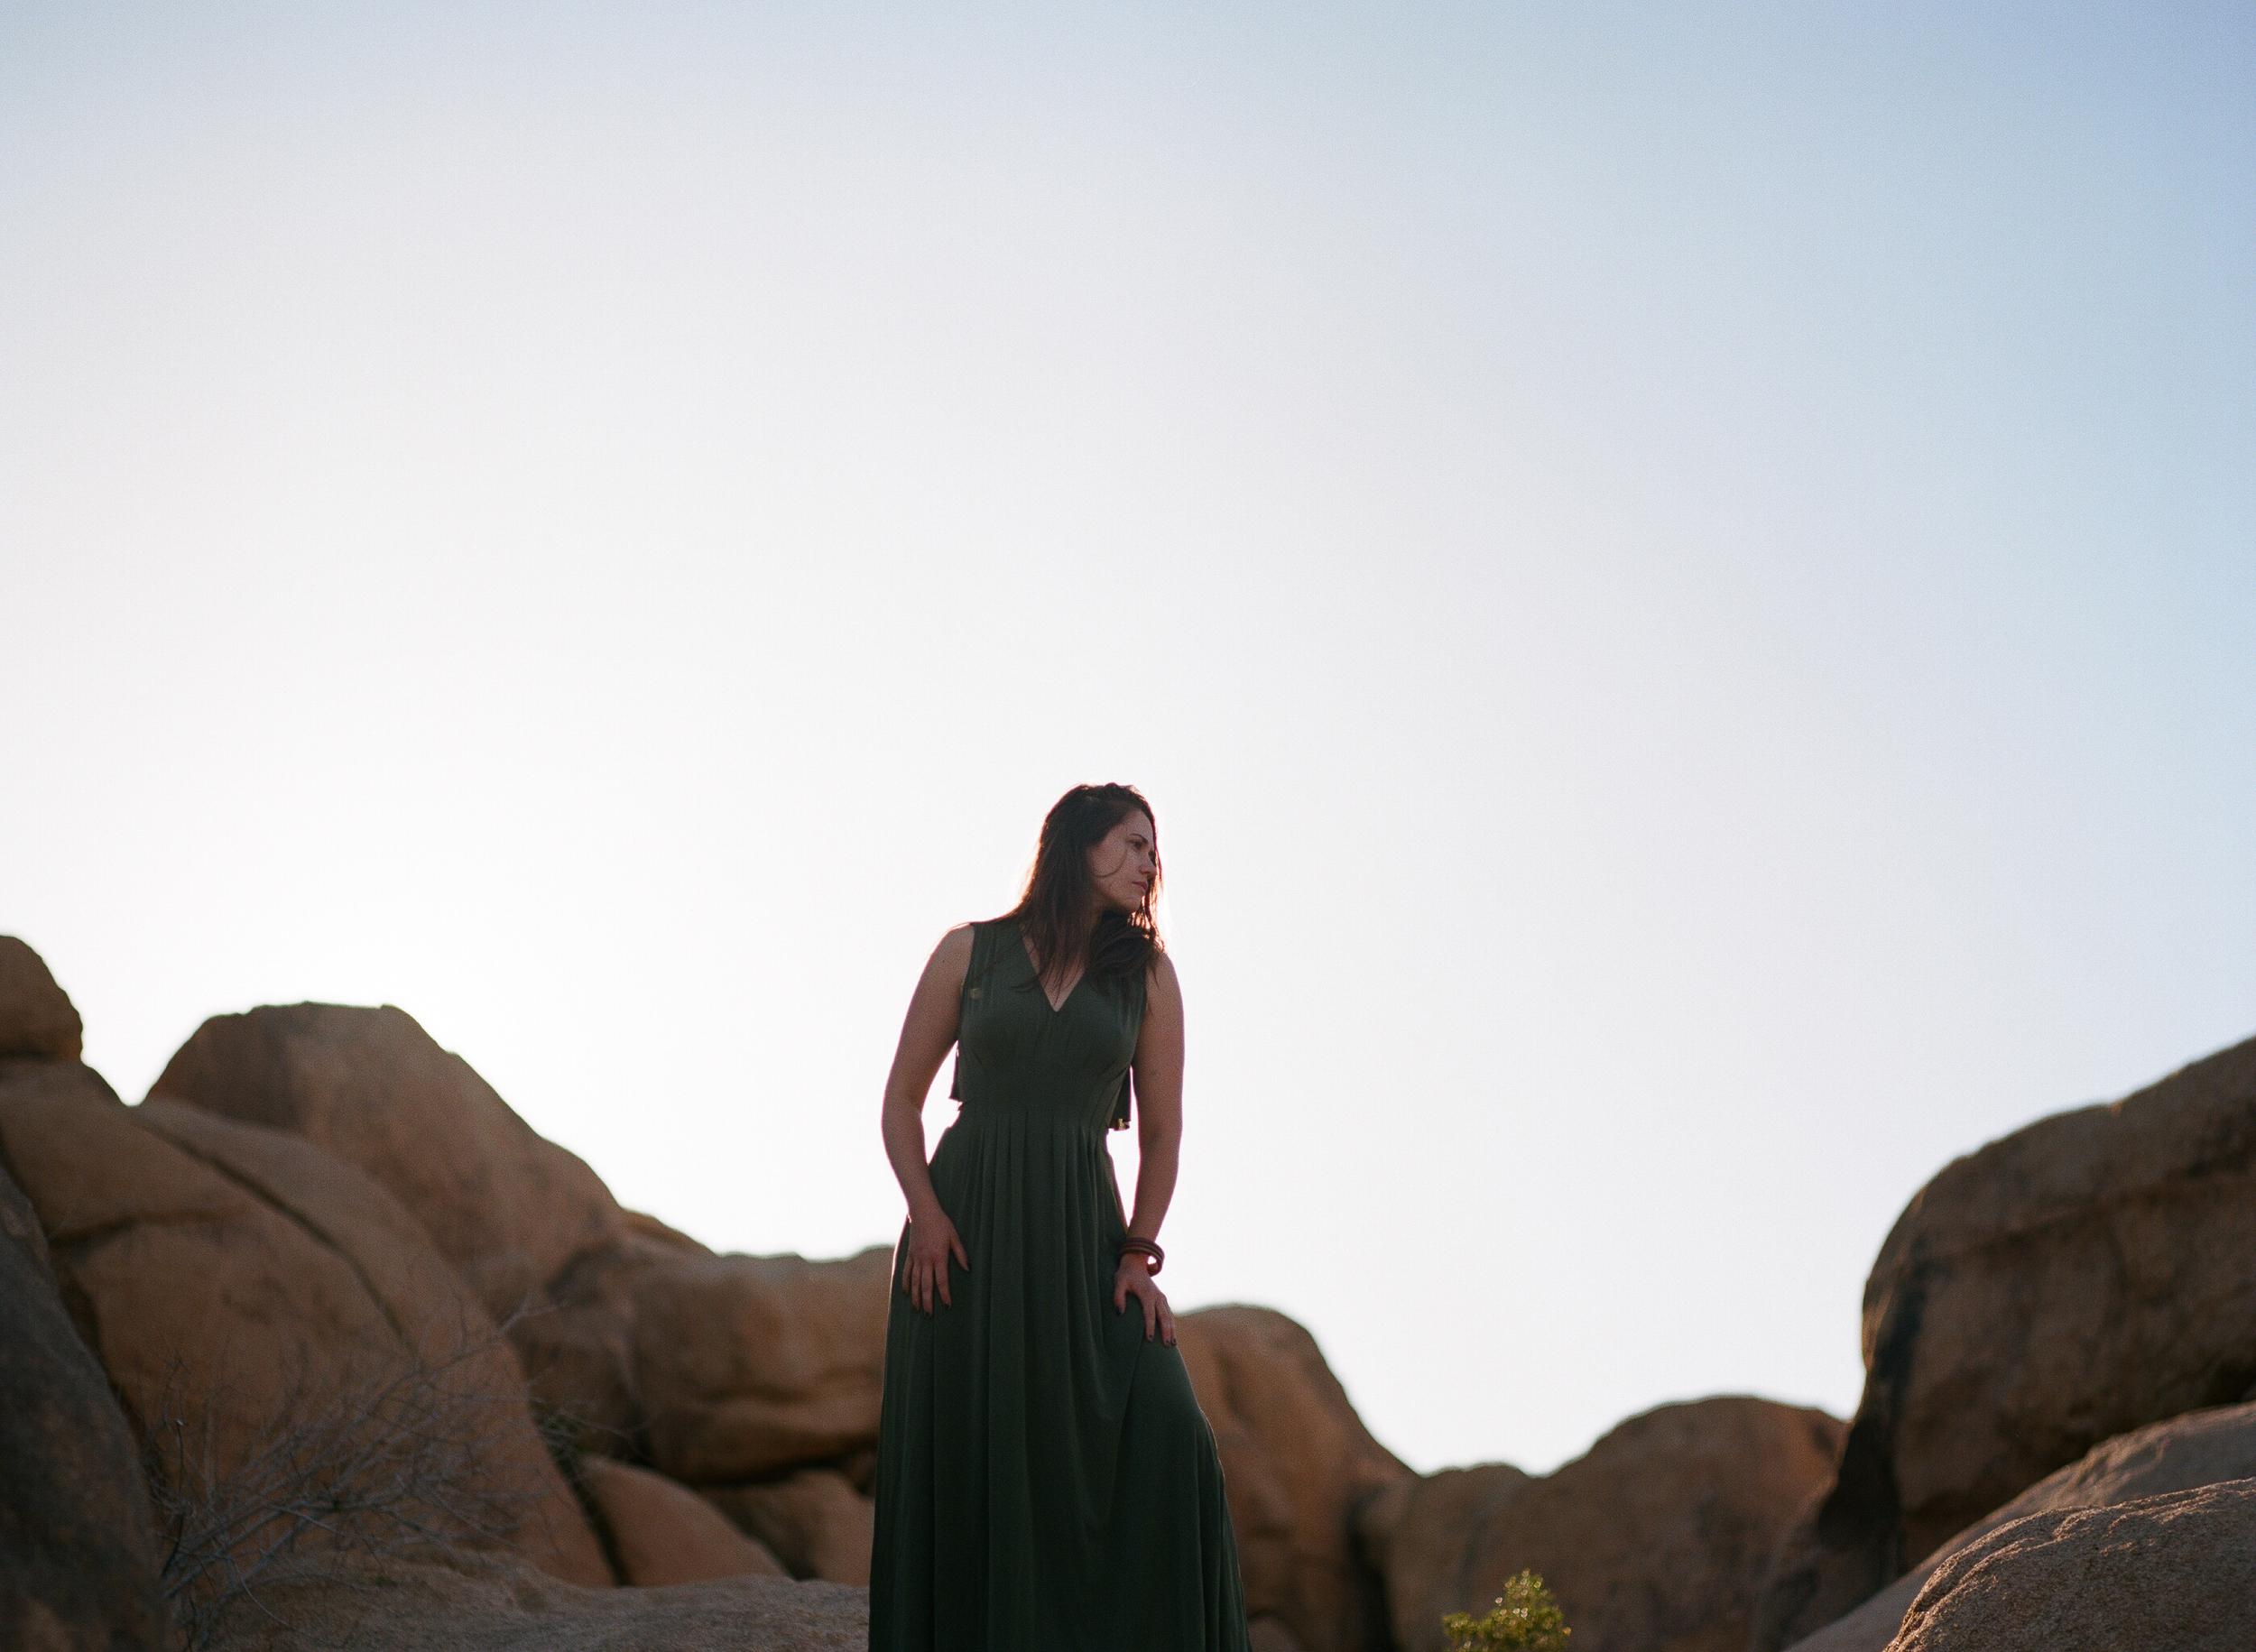 Kristen-Humbert-Philadelphia-Photographer-Joshua-Tree-35180005.jpg